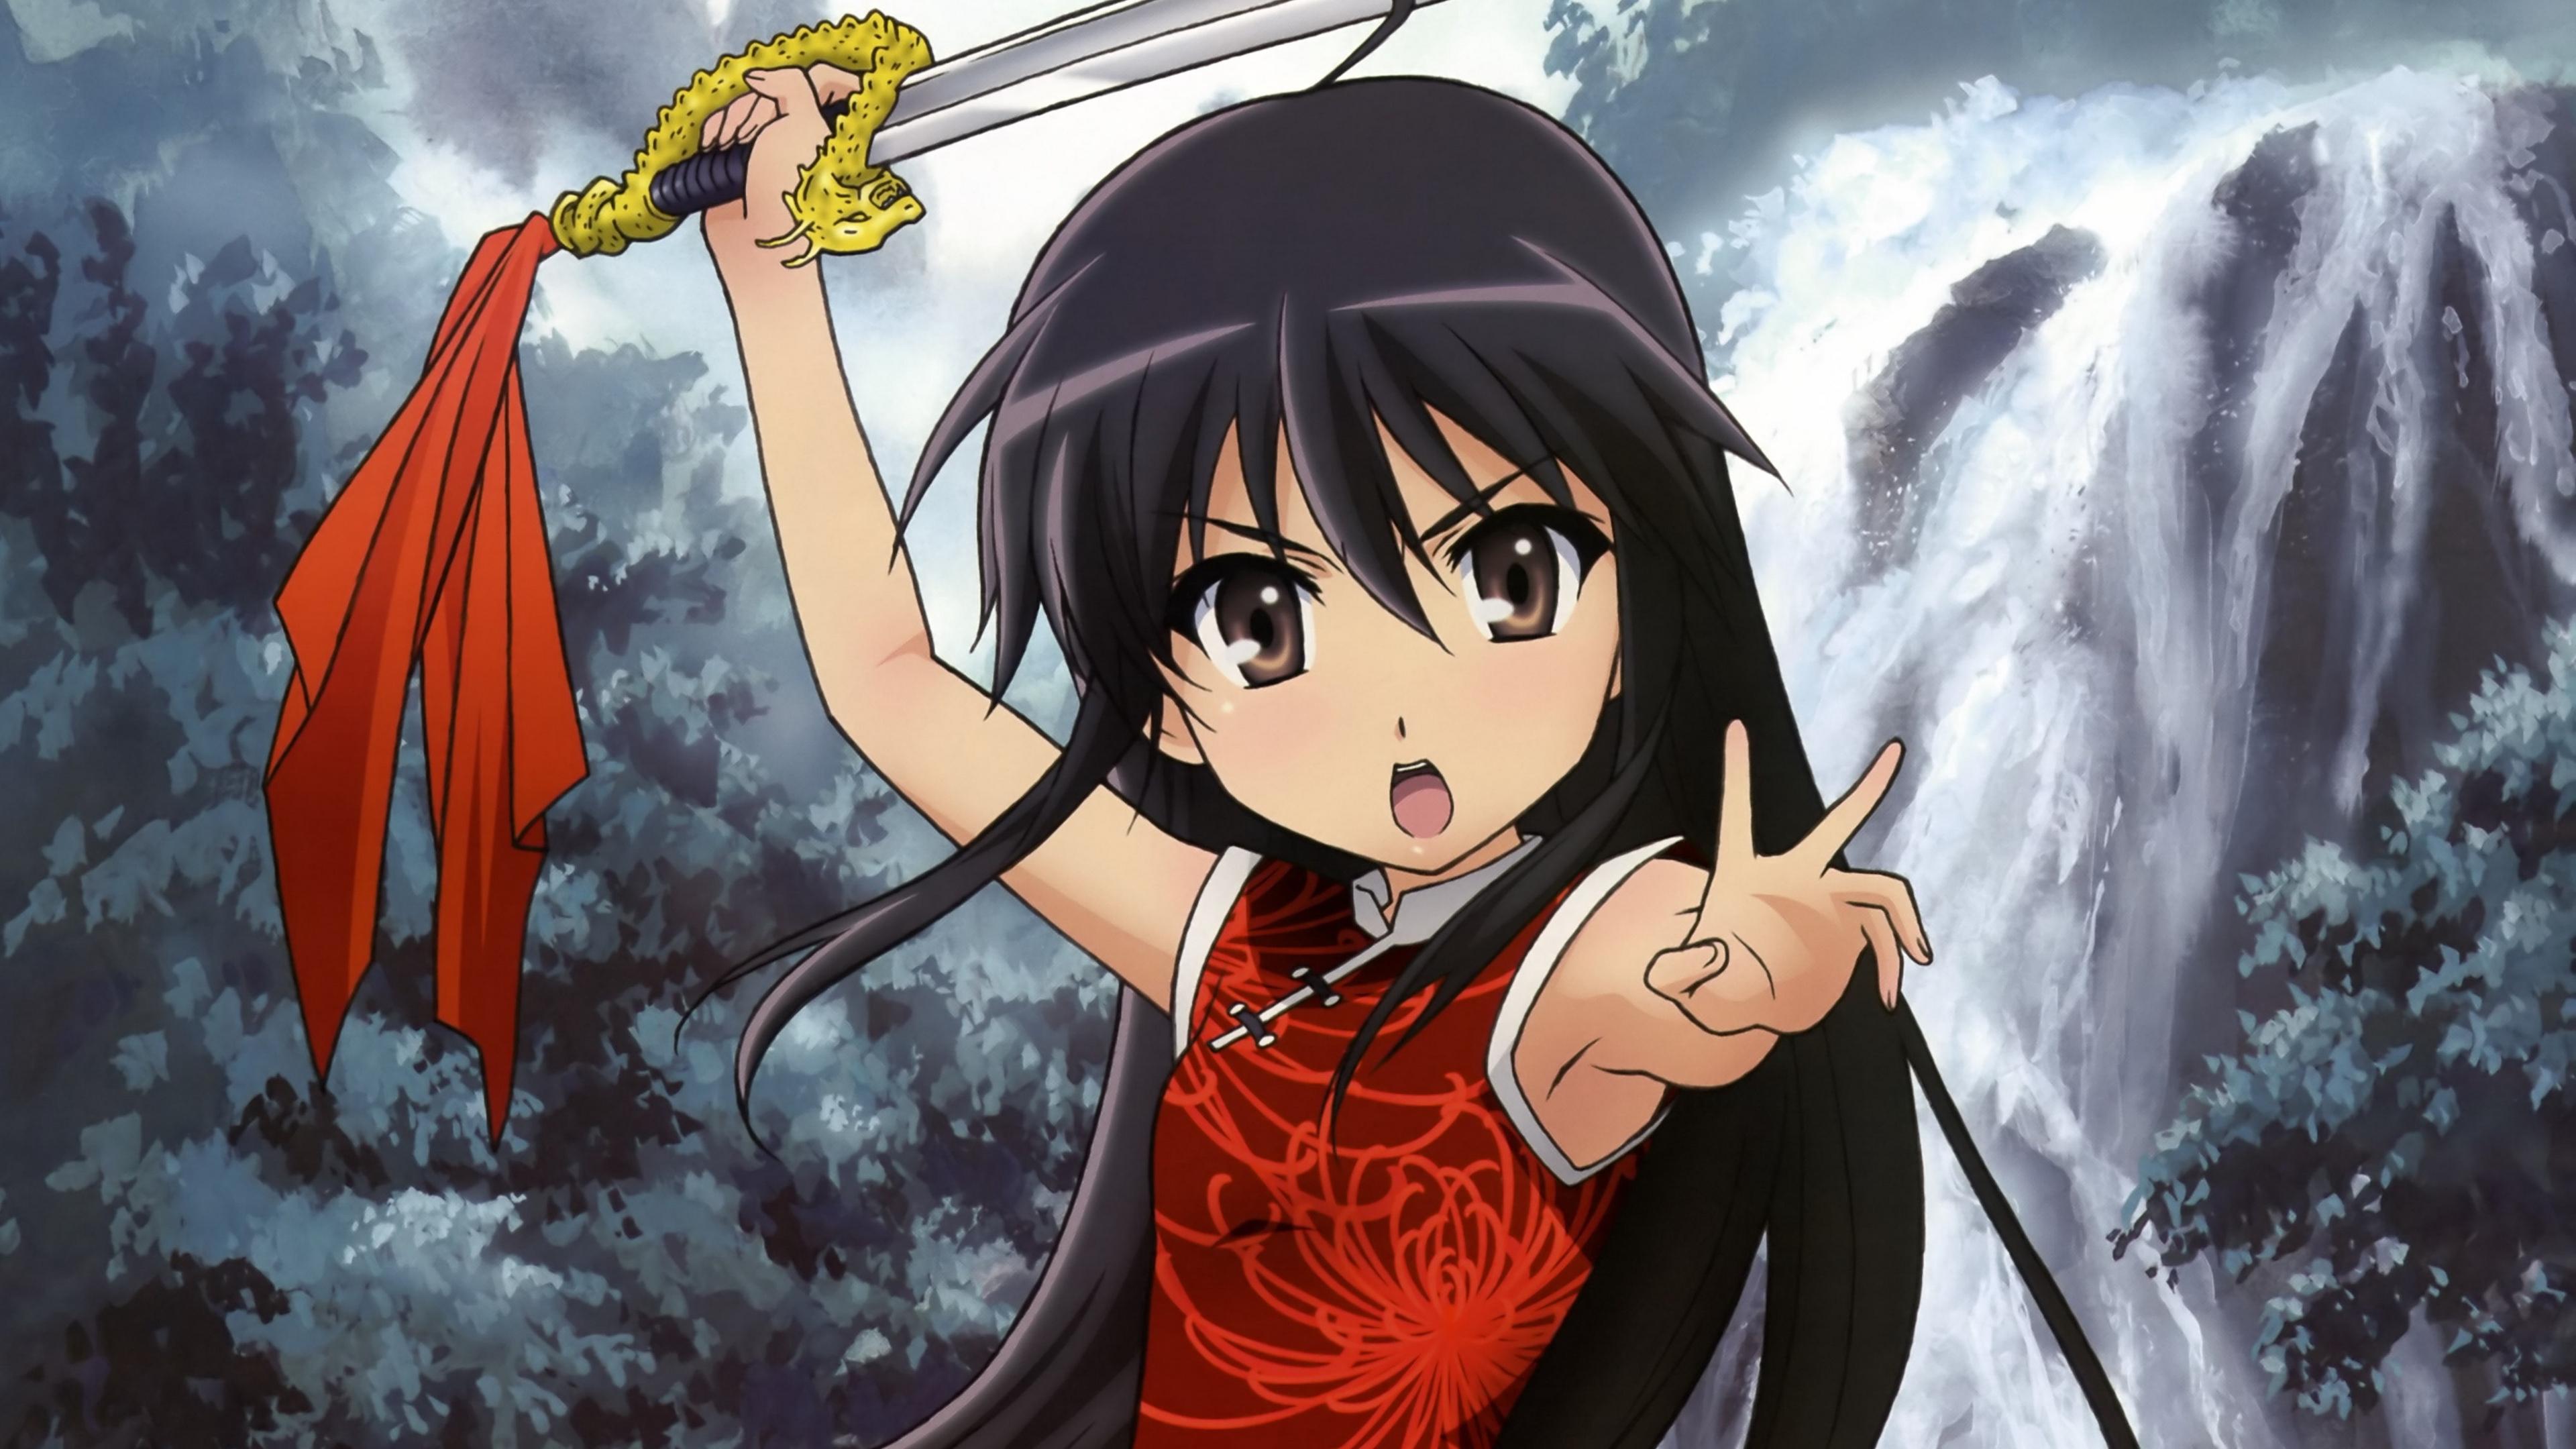 shakugan no shana girl brunette sword warrior 4k 1541975607 - shakugan no shana, girl, brunette, sword, warrior 4k - shakugan no shana, Girl, brunette